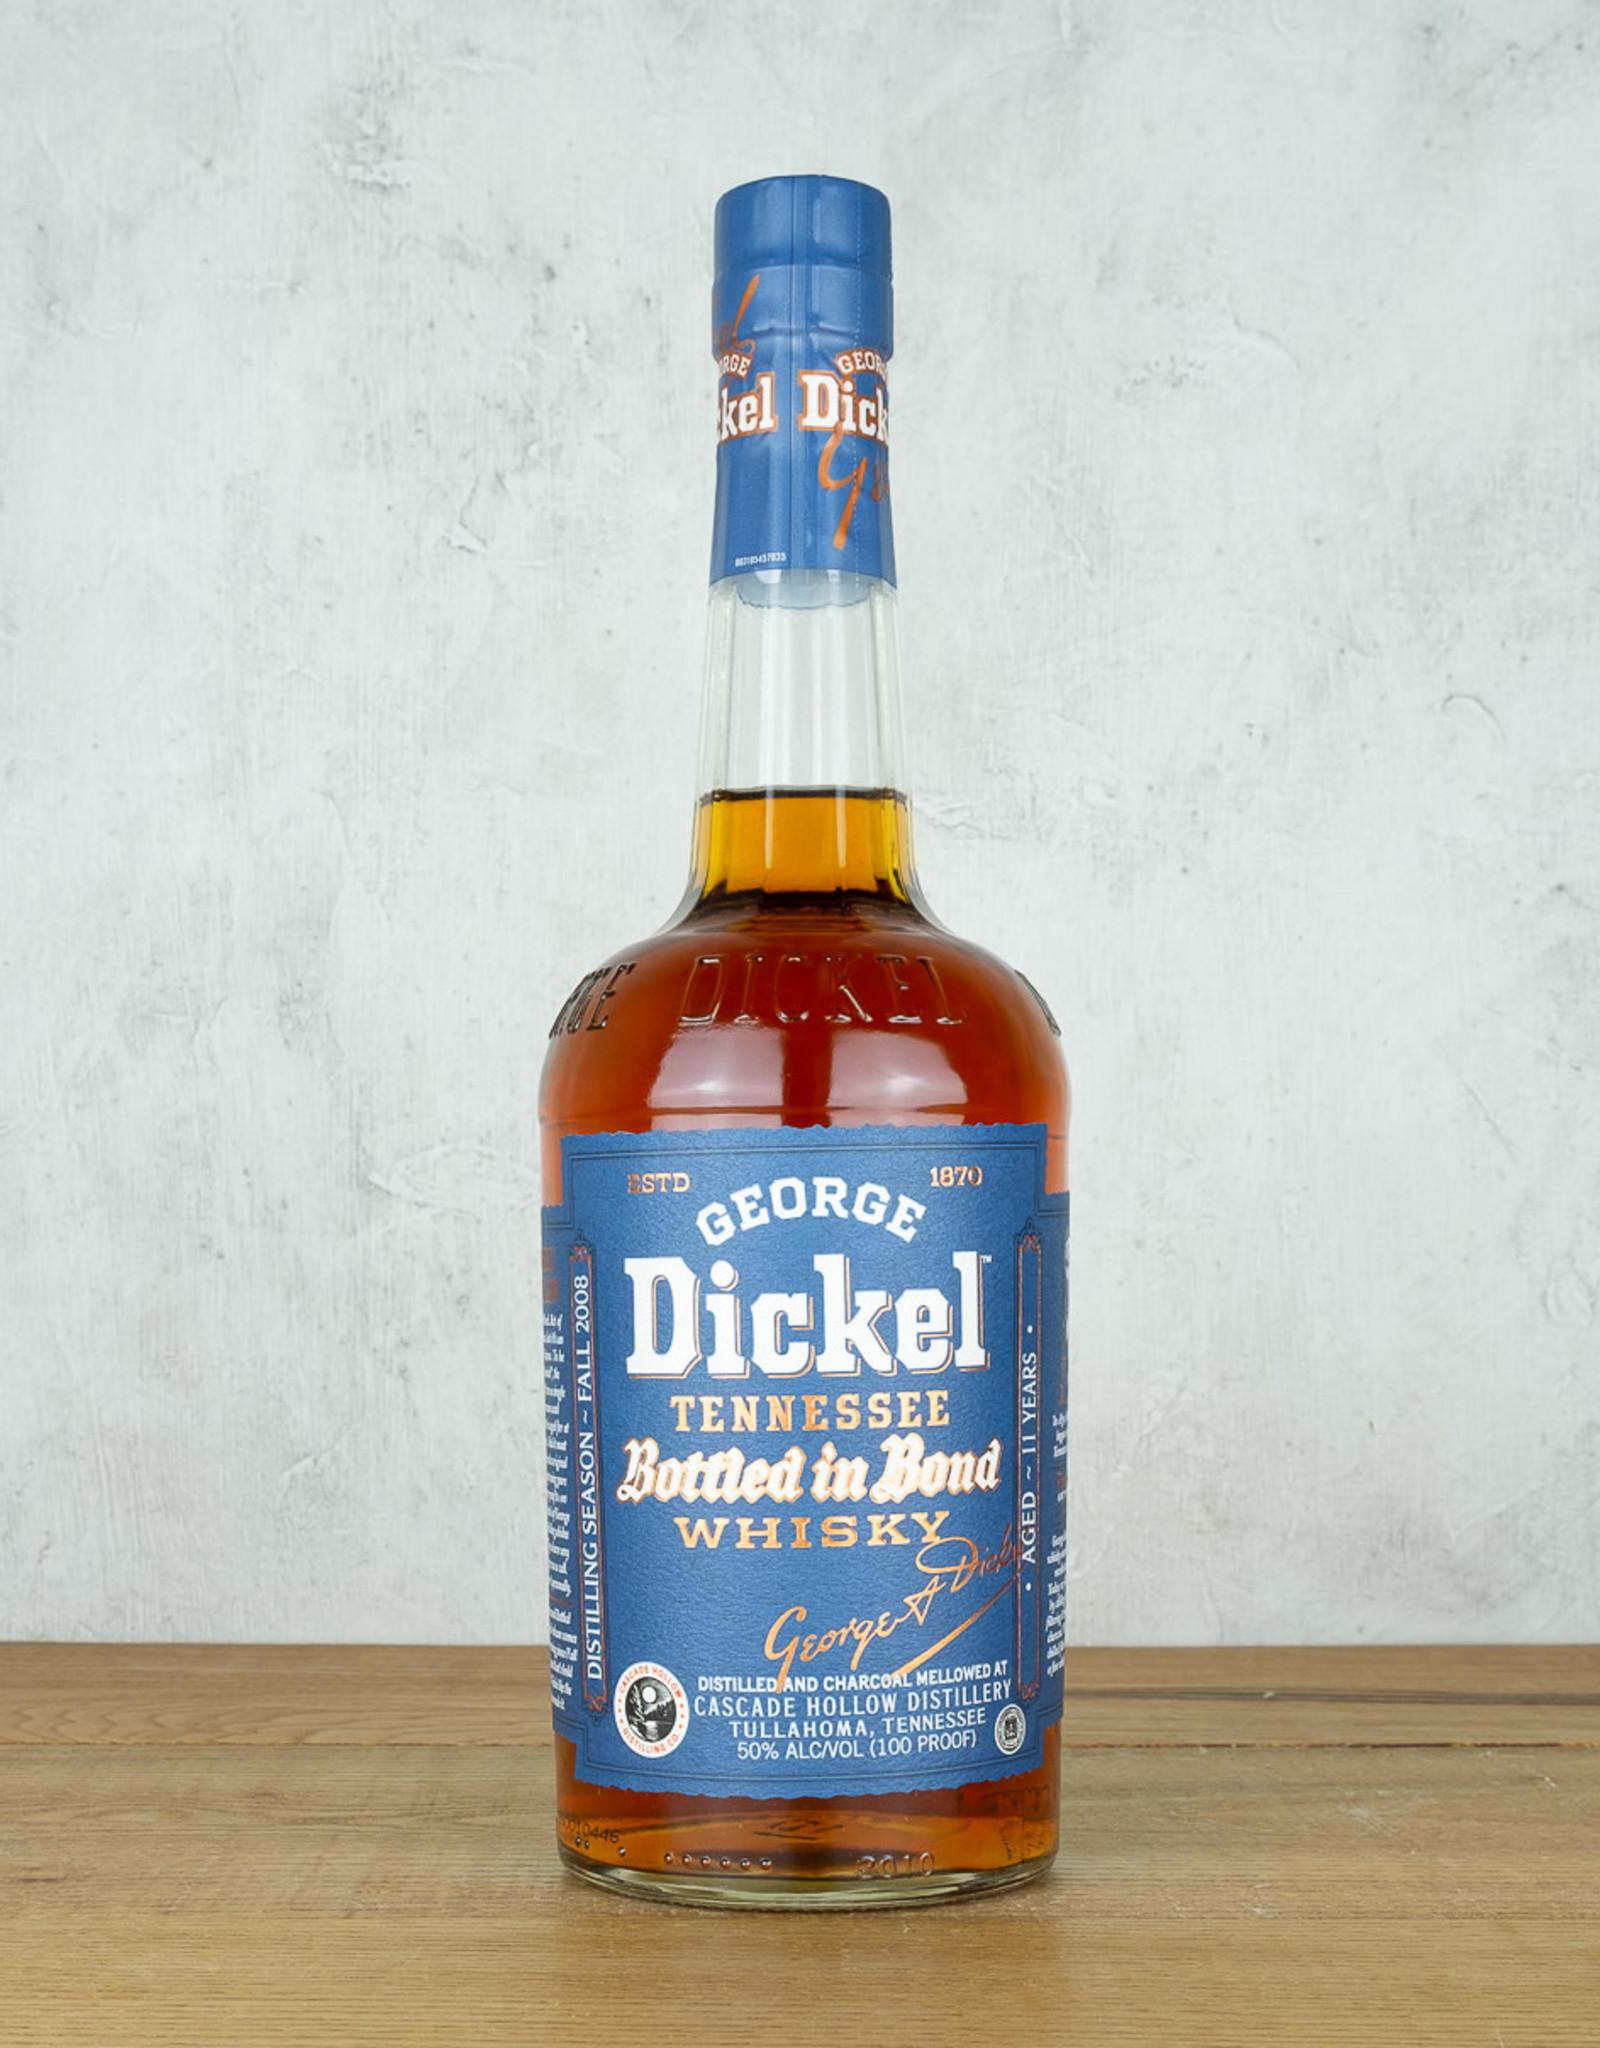 George Dickel Tennessee Whiskey Bottled in Bond